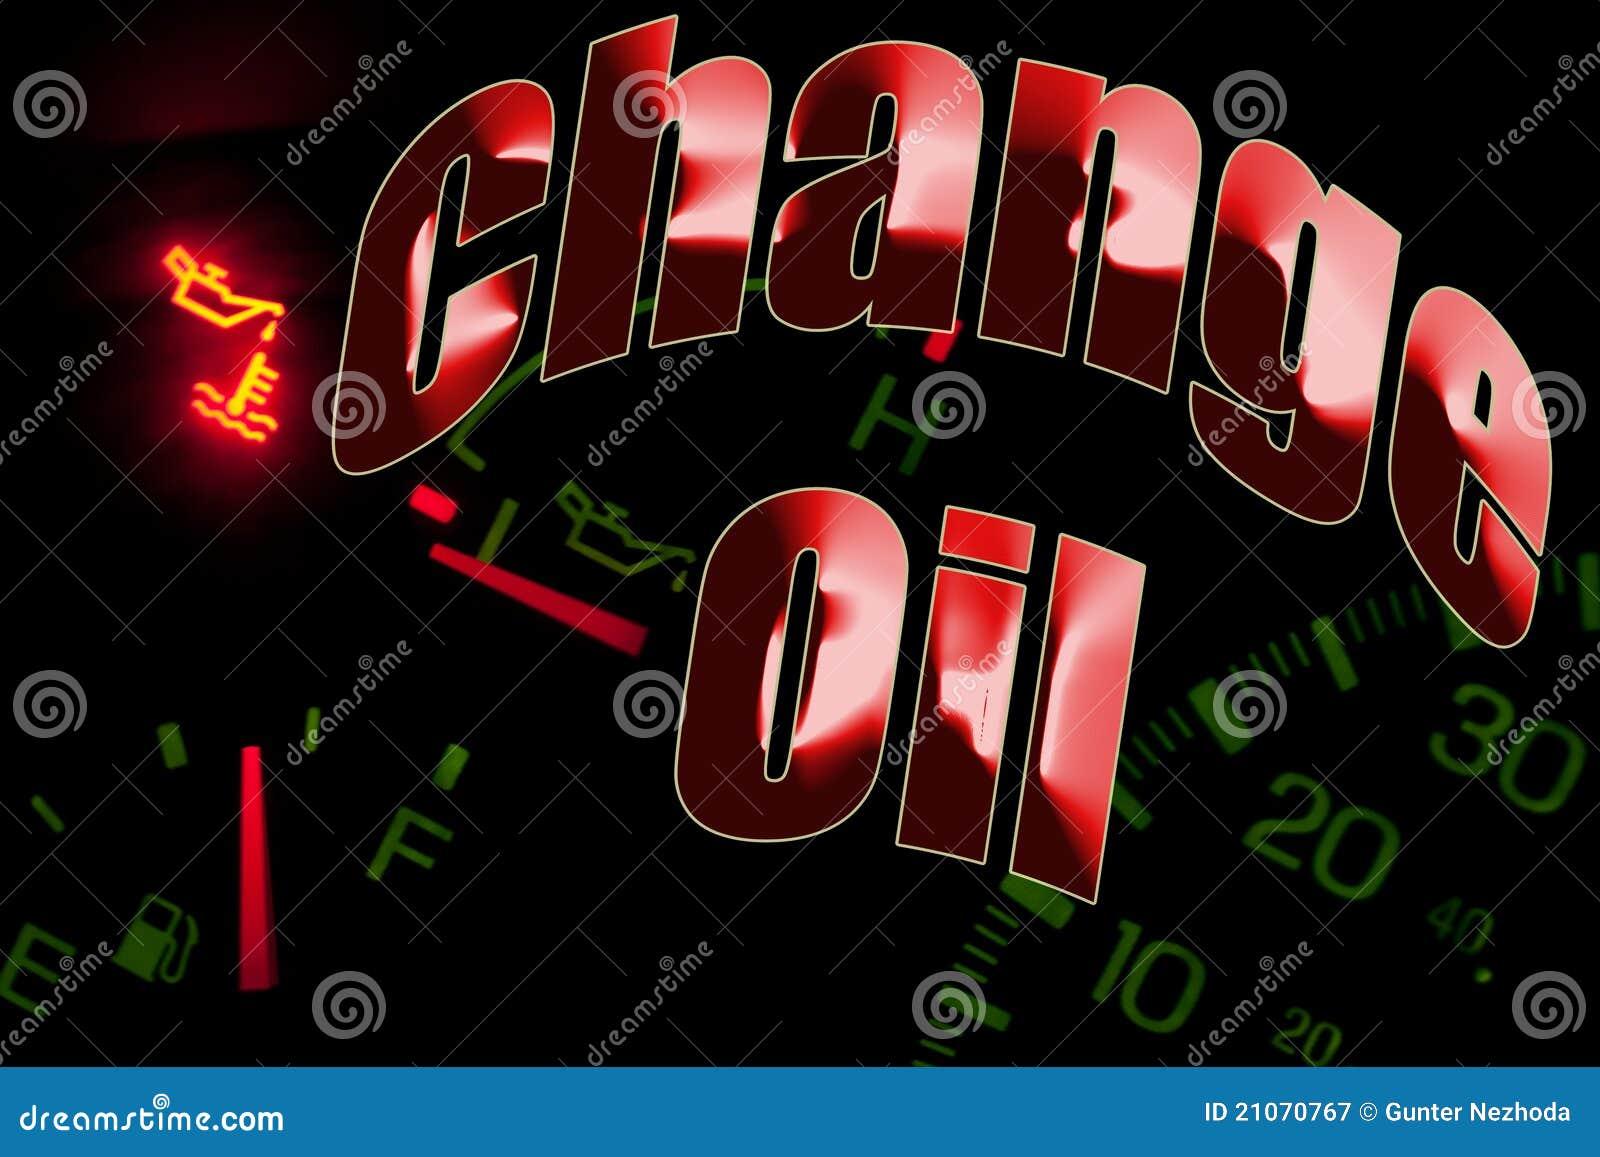 Change Oil Service Engine Light Stock Illustration